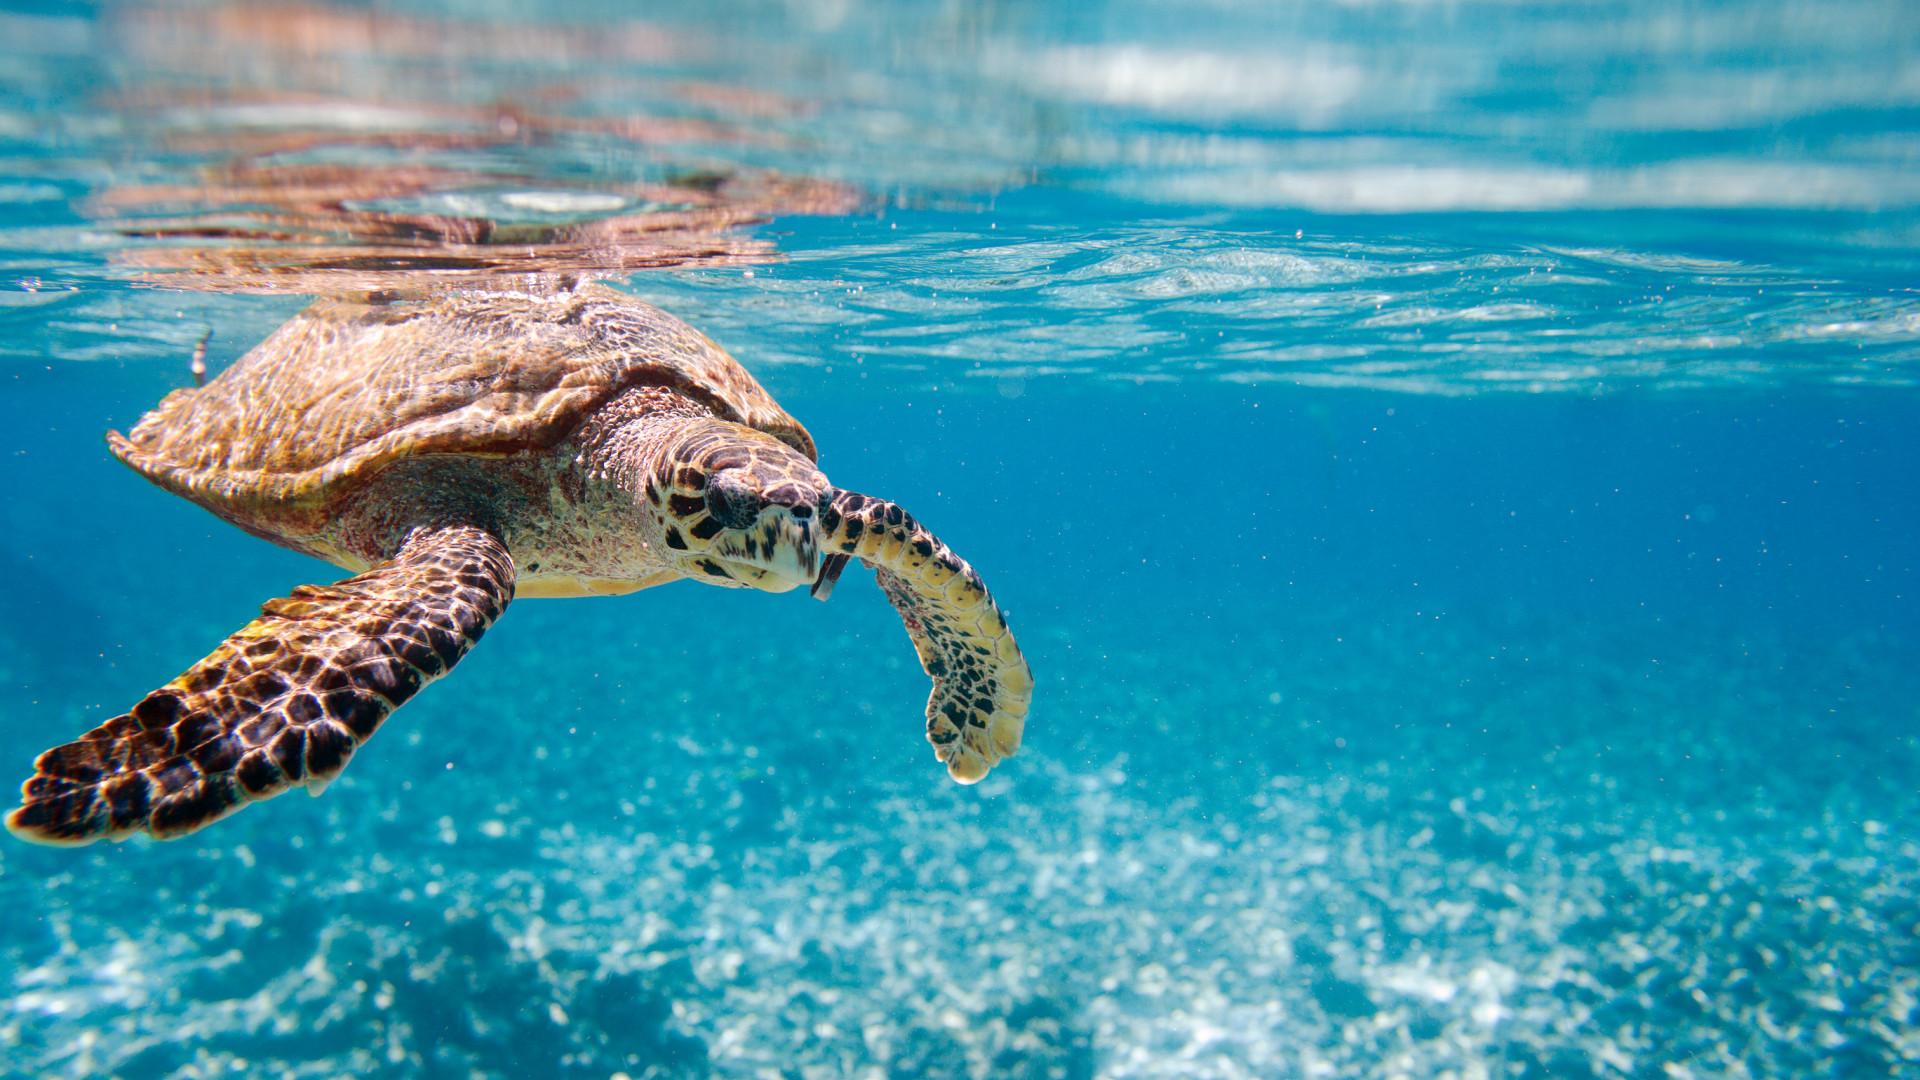 The endangered hawksbill turtle